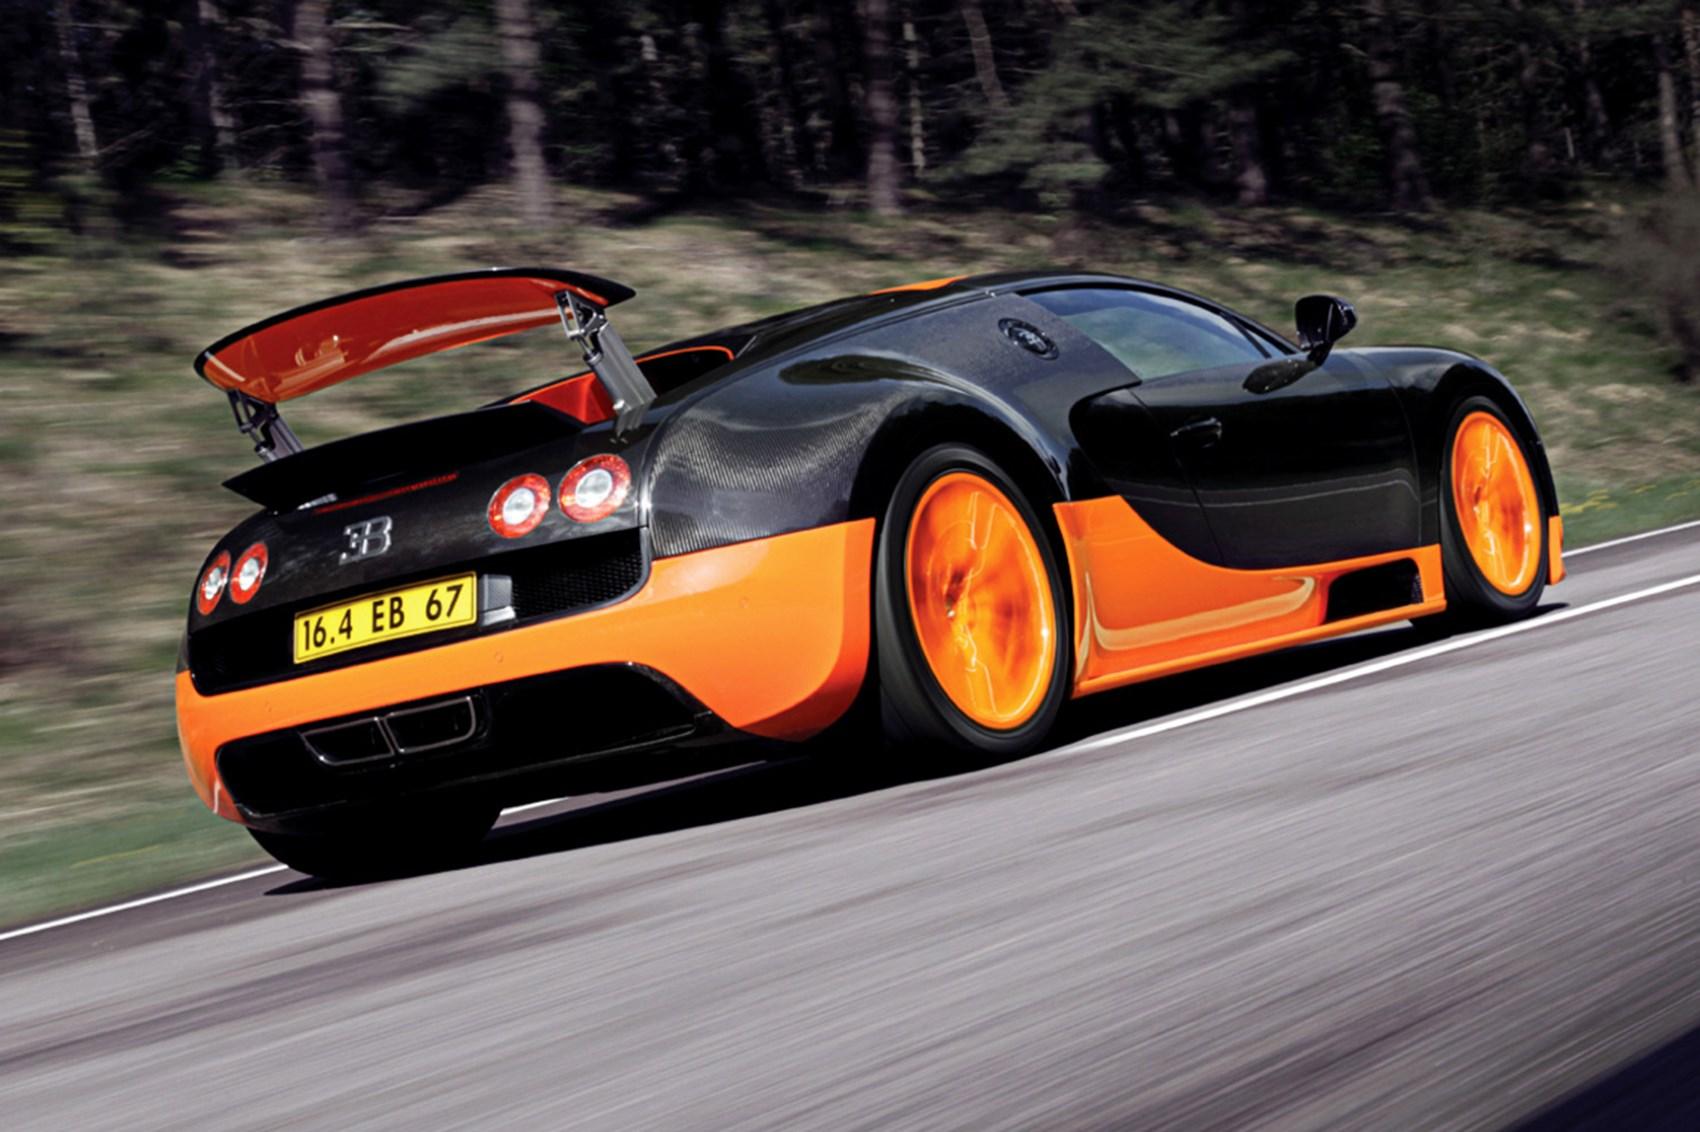 Fastest: Bugatti Veyron Super Sport